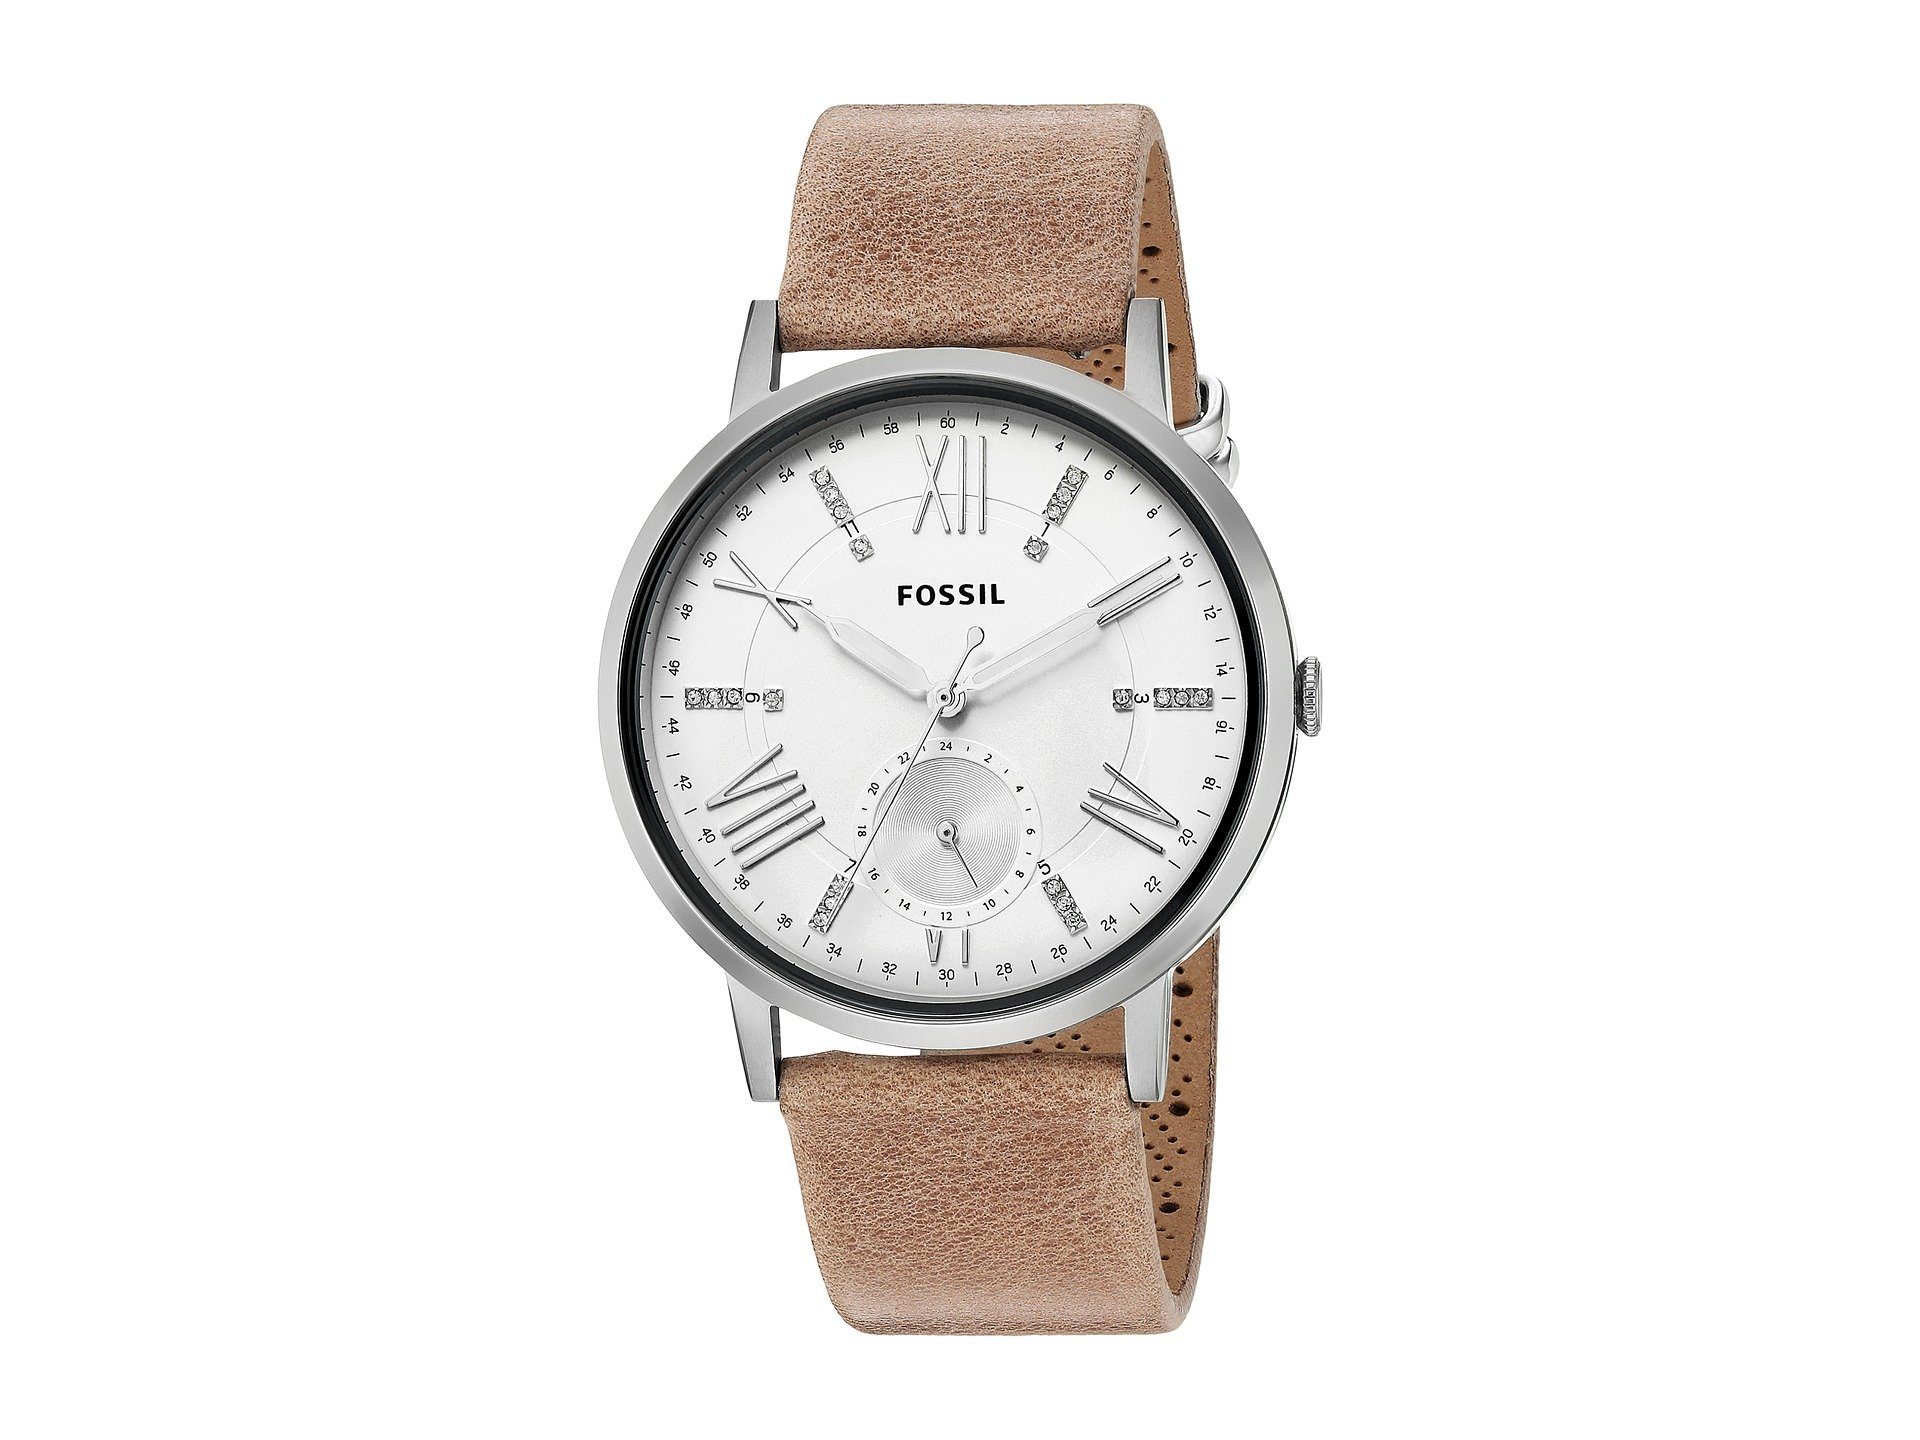 Reloj para Mujer Fossil Gazer Leather - ES4162  + Fossil en VeoyCompro.net